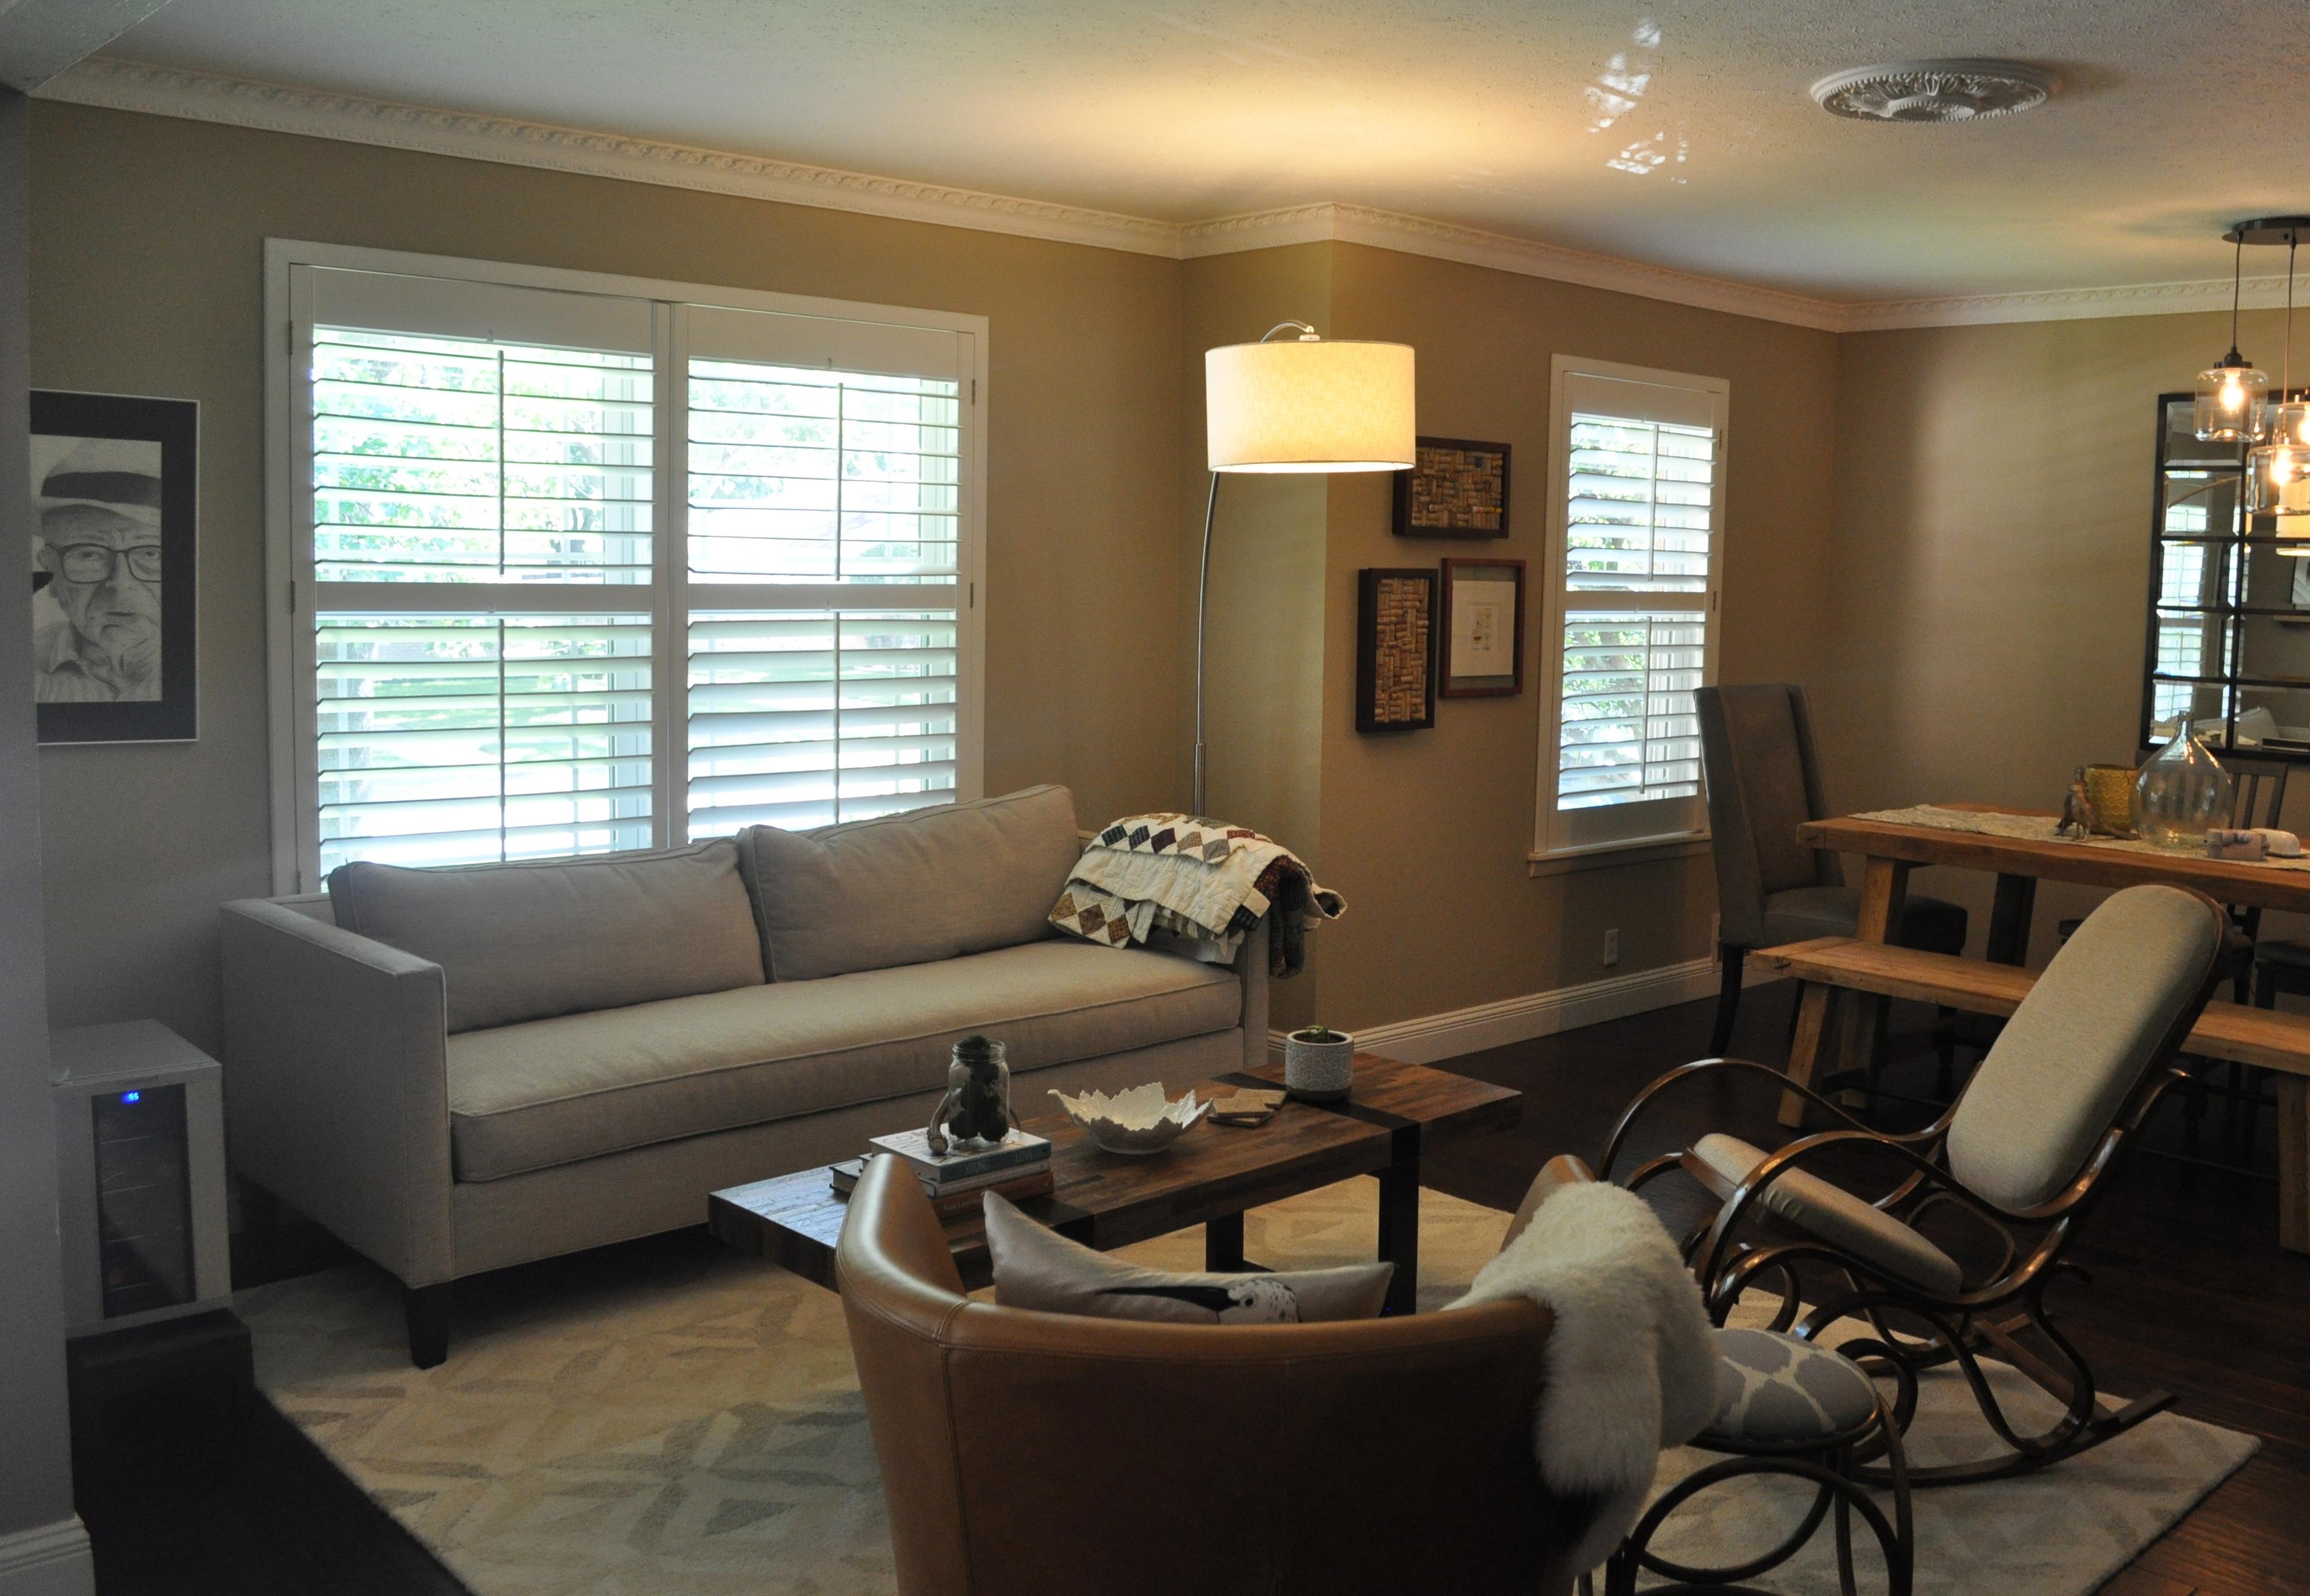 bennington gray walls home decorating paint colors pinterest